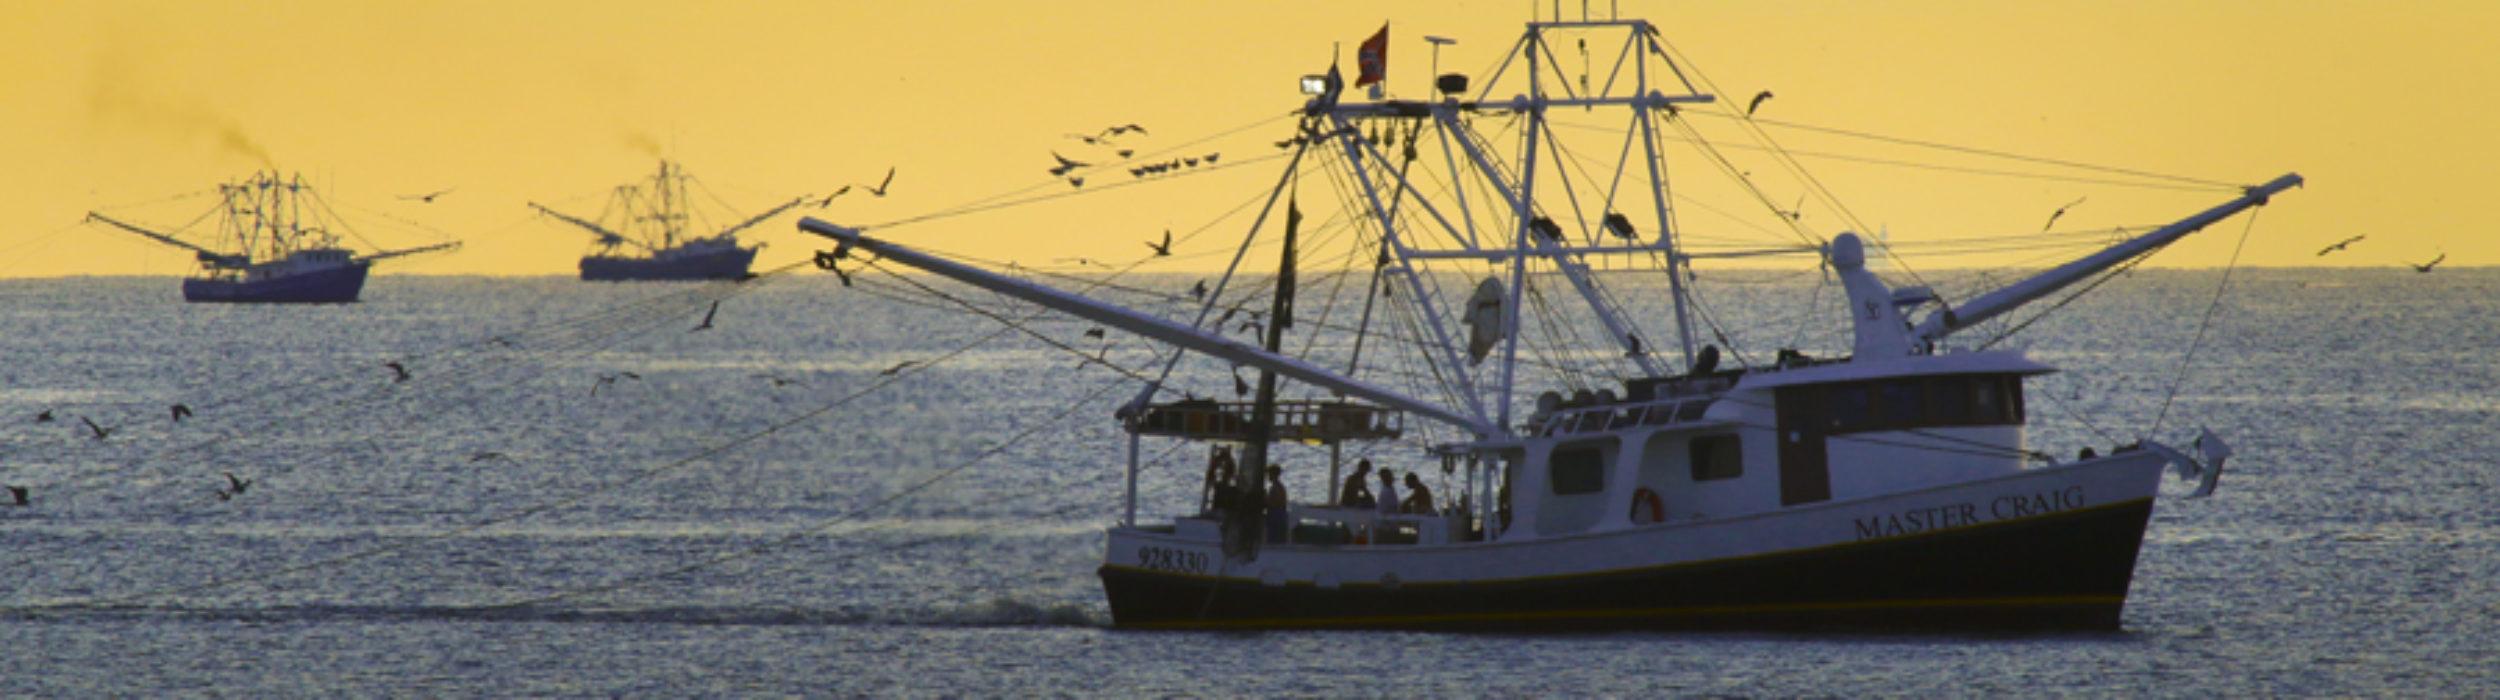 Gulf Seafood Foundation